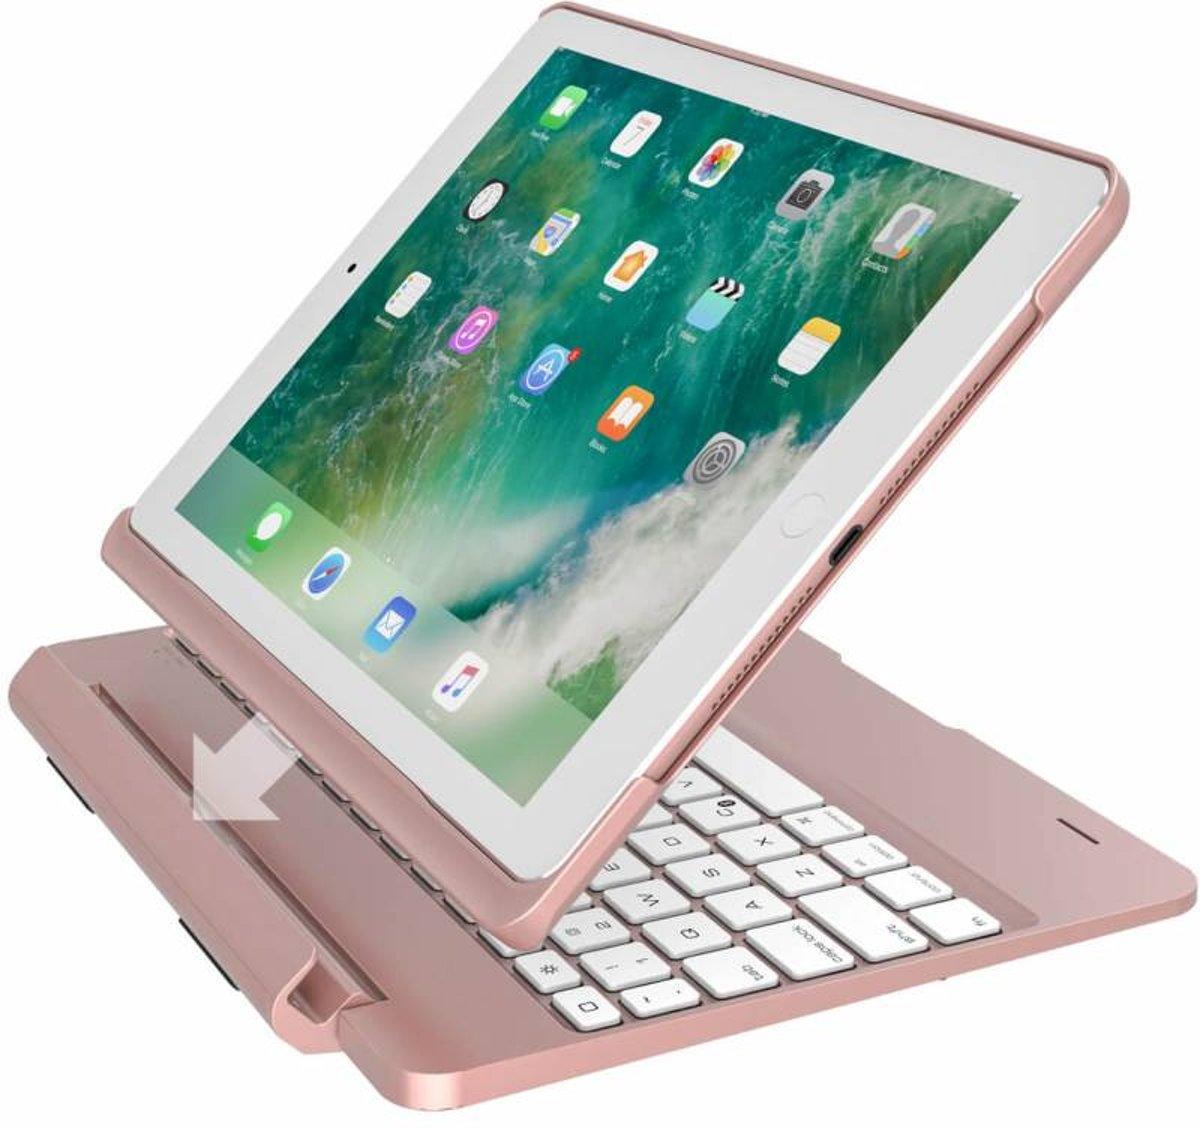 iPadspullekes.nl iPad 2017 toetsenbord met afneembare case roze kopen